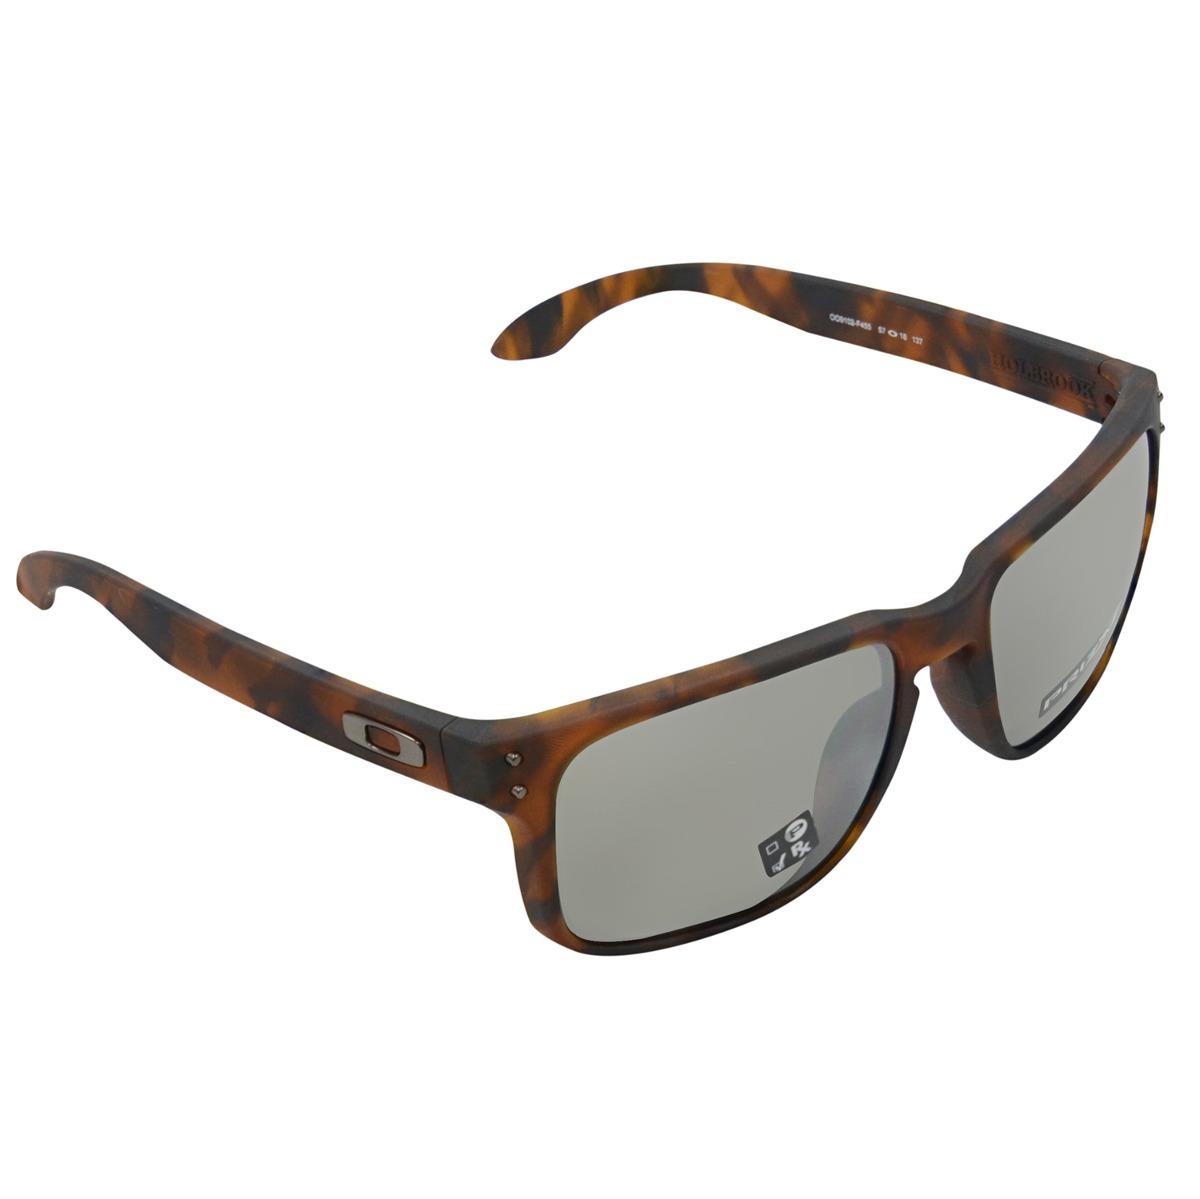 4082f01dbbfe0 óculos oakley holbrook tortue marrom. Carregando zoom.